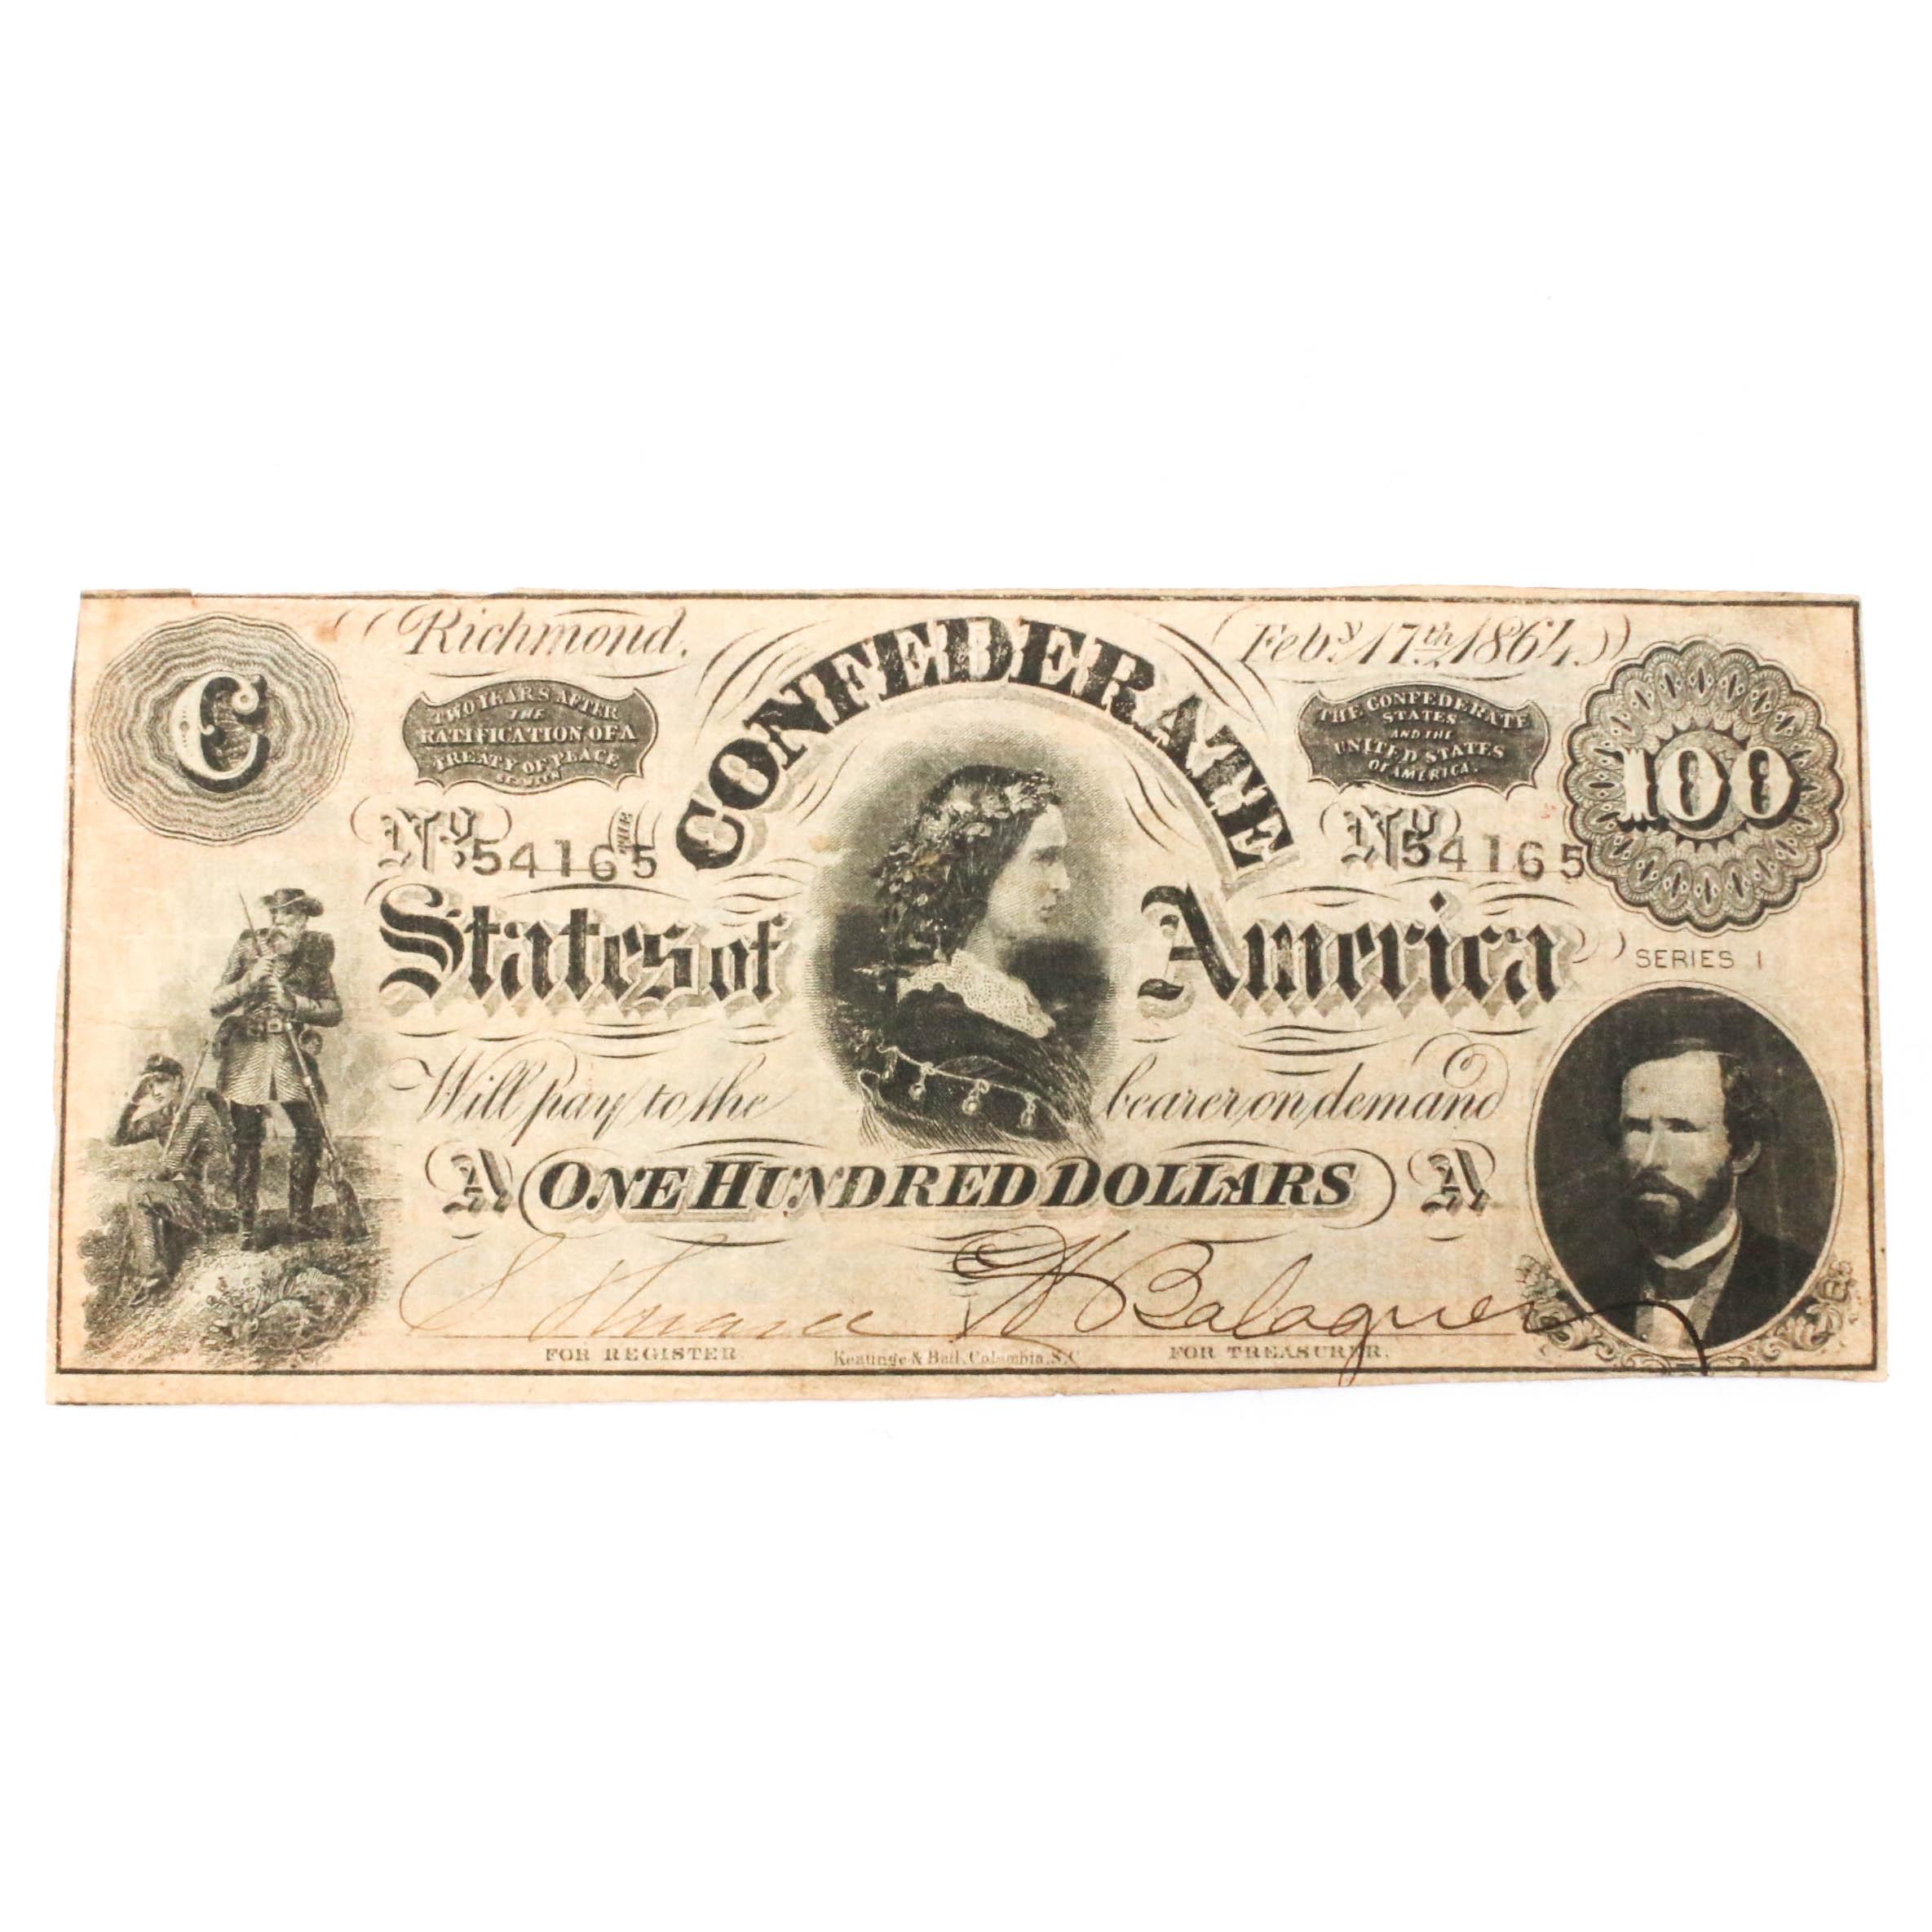 1864 Confederate States of America $100 Banknote